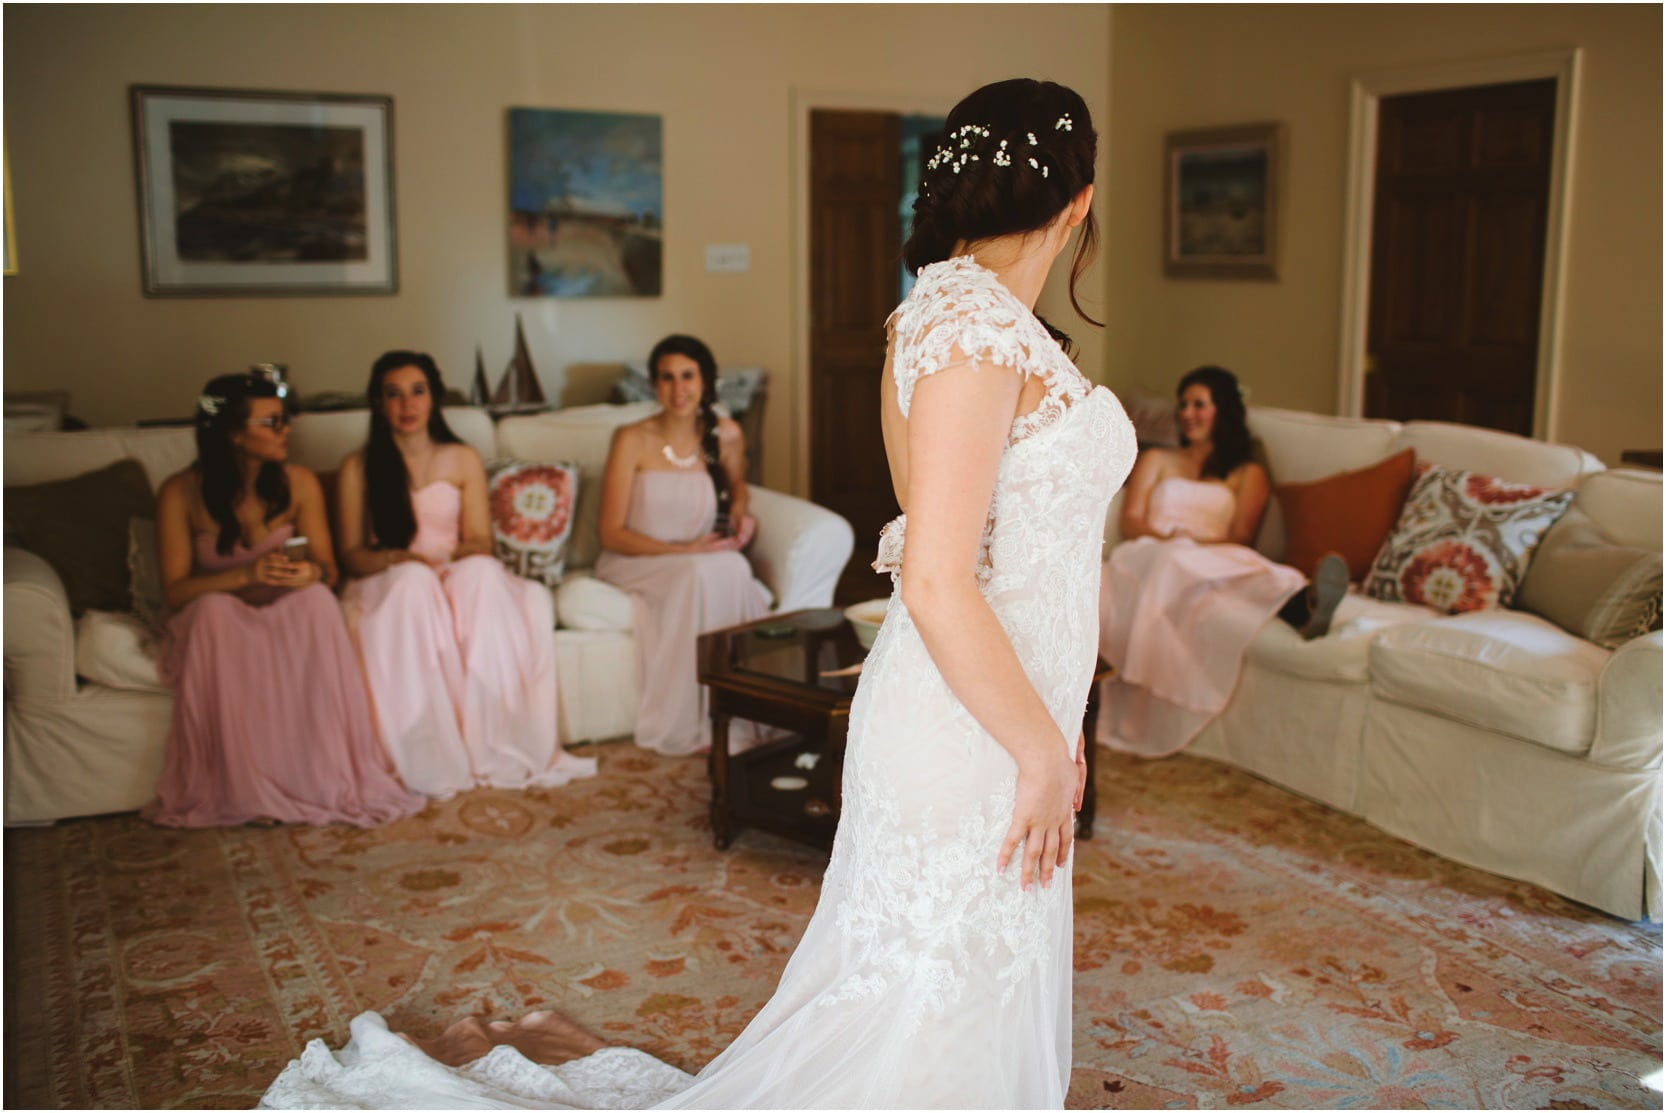 naomijacob_covington_wedding__61_blogstomped